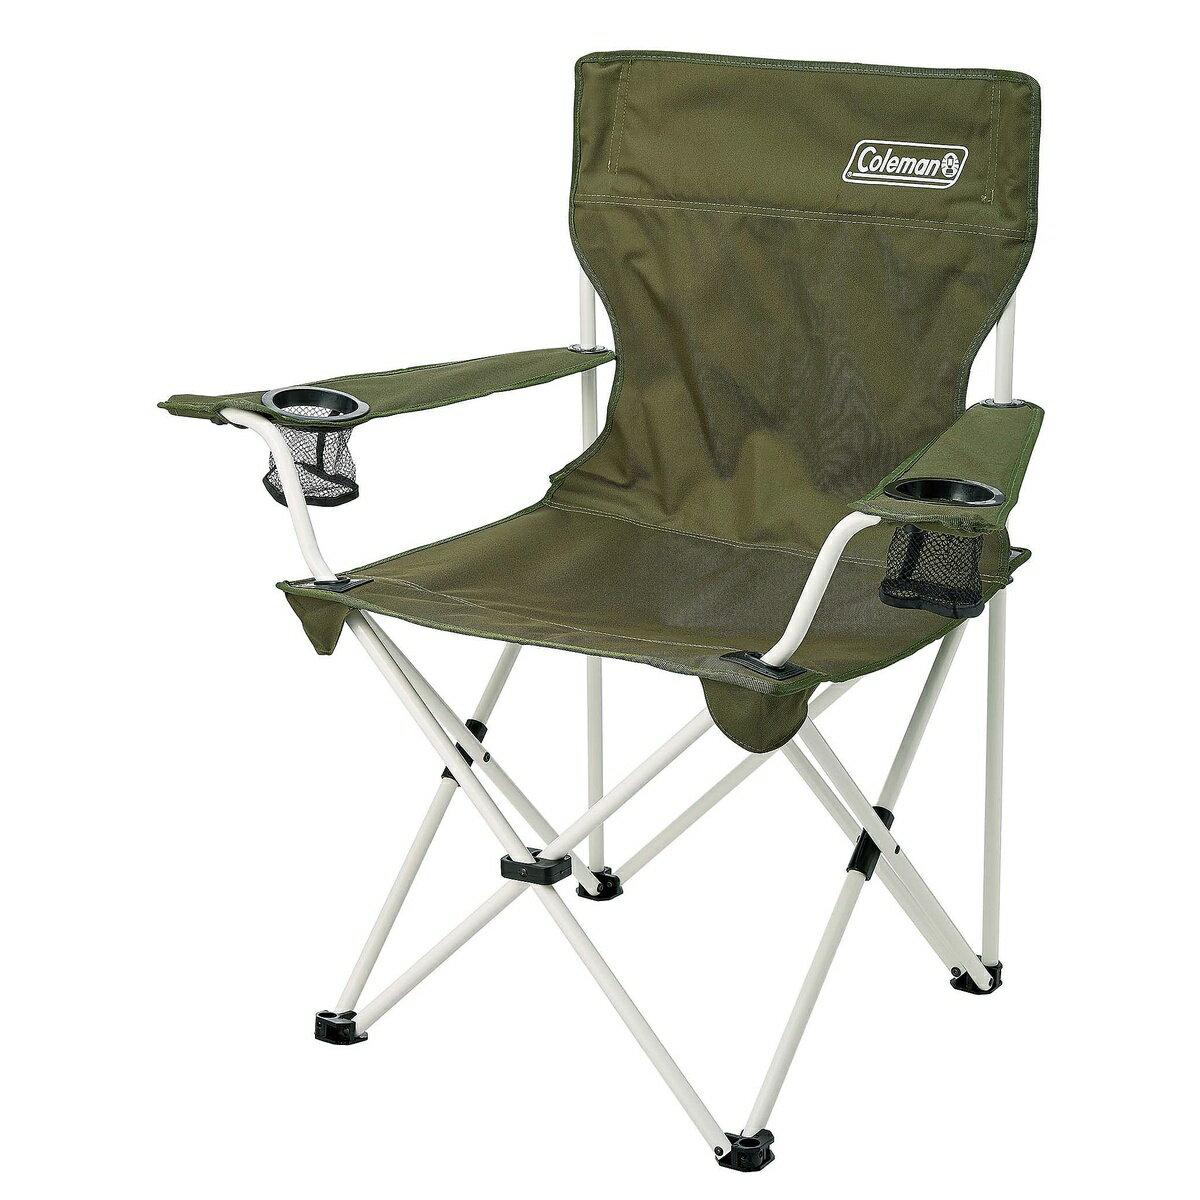 COLEMAN (コールマン) キャンプ用品 ファミリーチェア アクションチェア(オリーブ) 2000033560